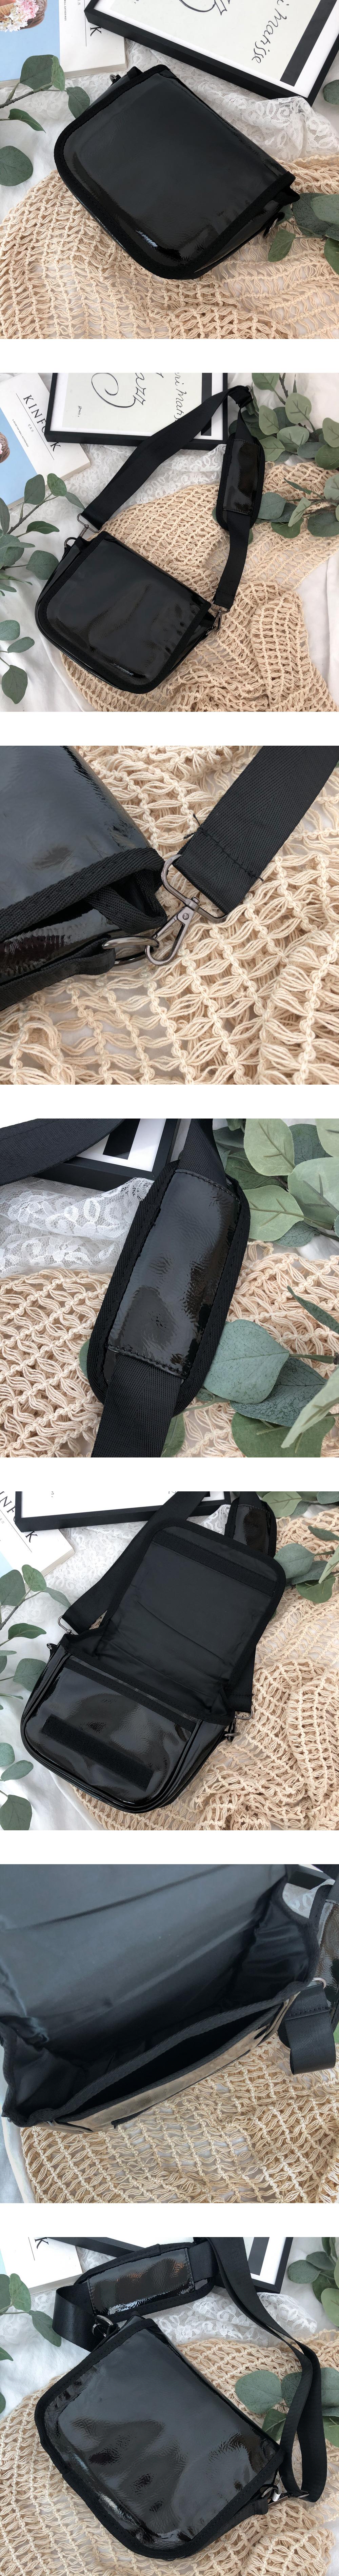 1959 Shiny Mini Daily Shoulder Bag